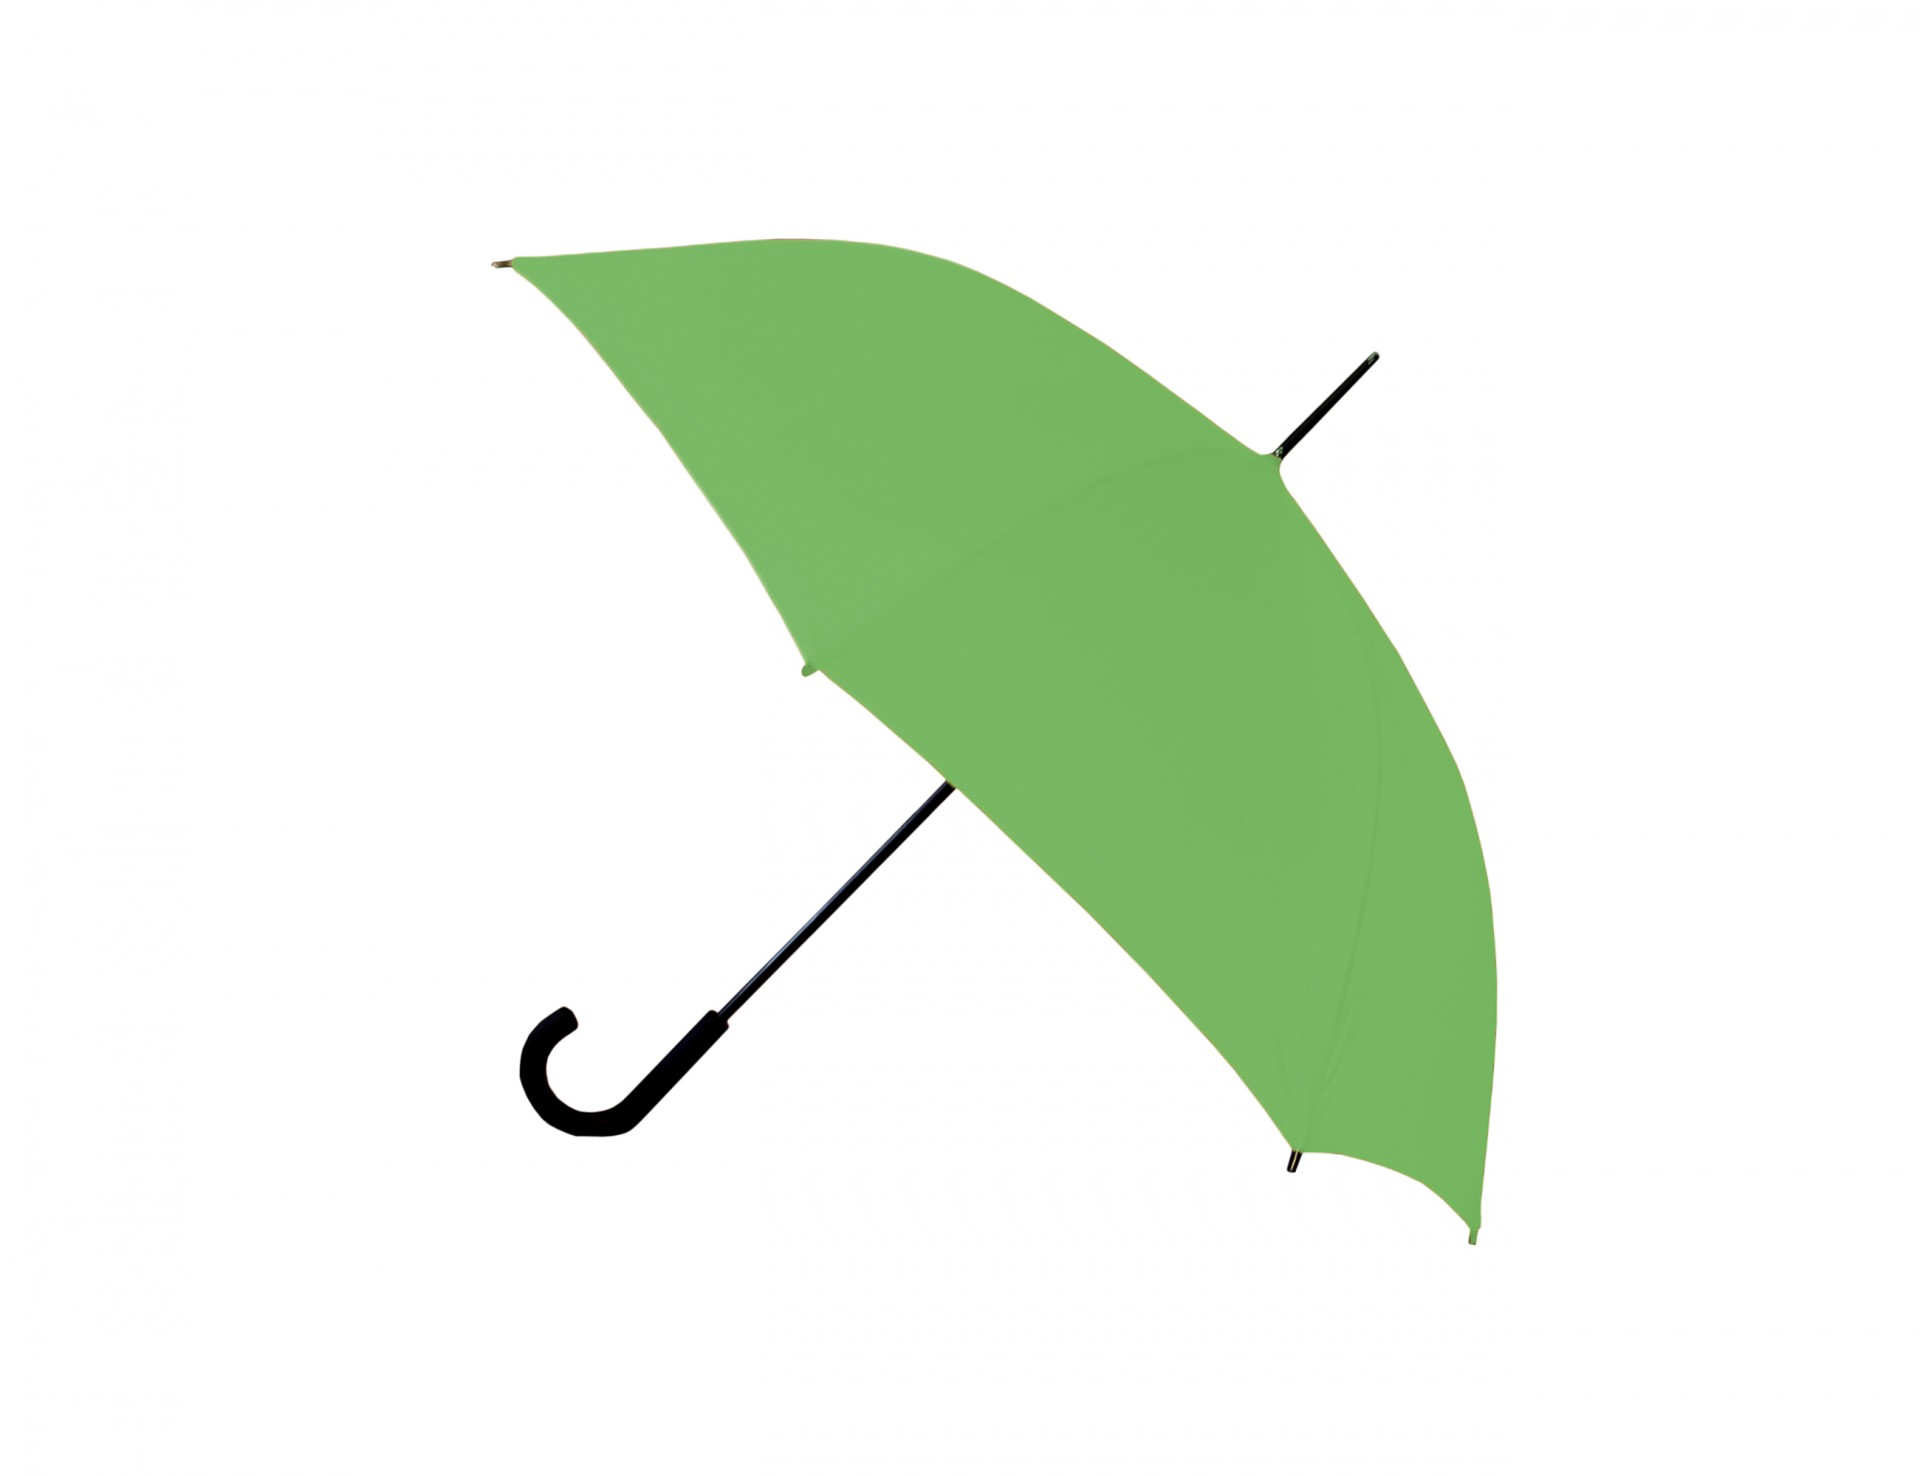 1920x1476 Green Umbrella Clipart Free Stock Photo